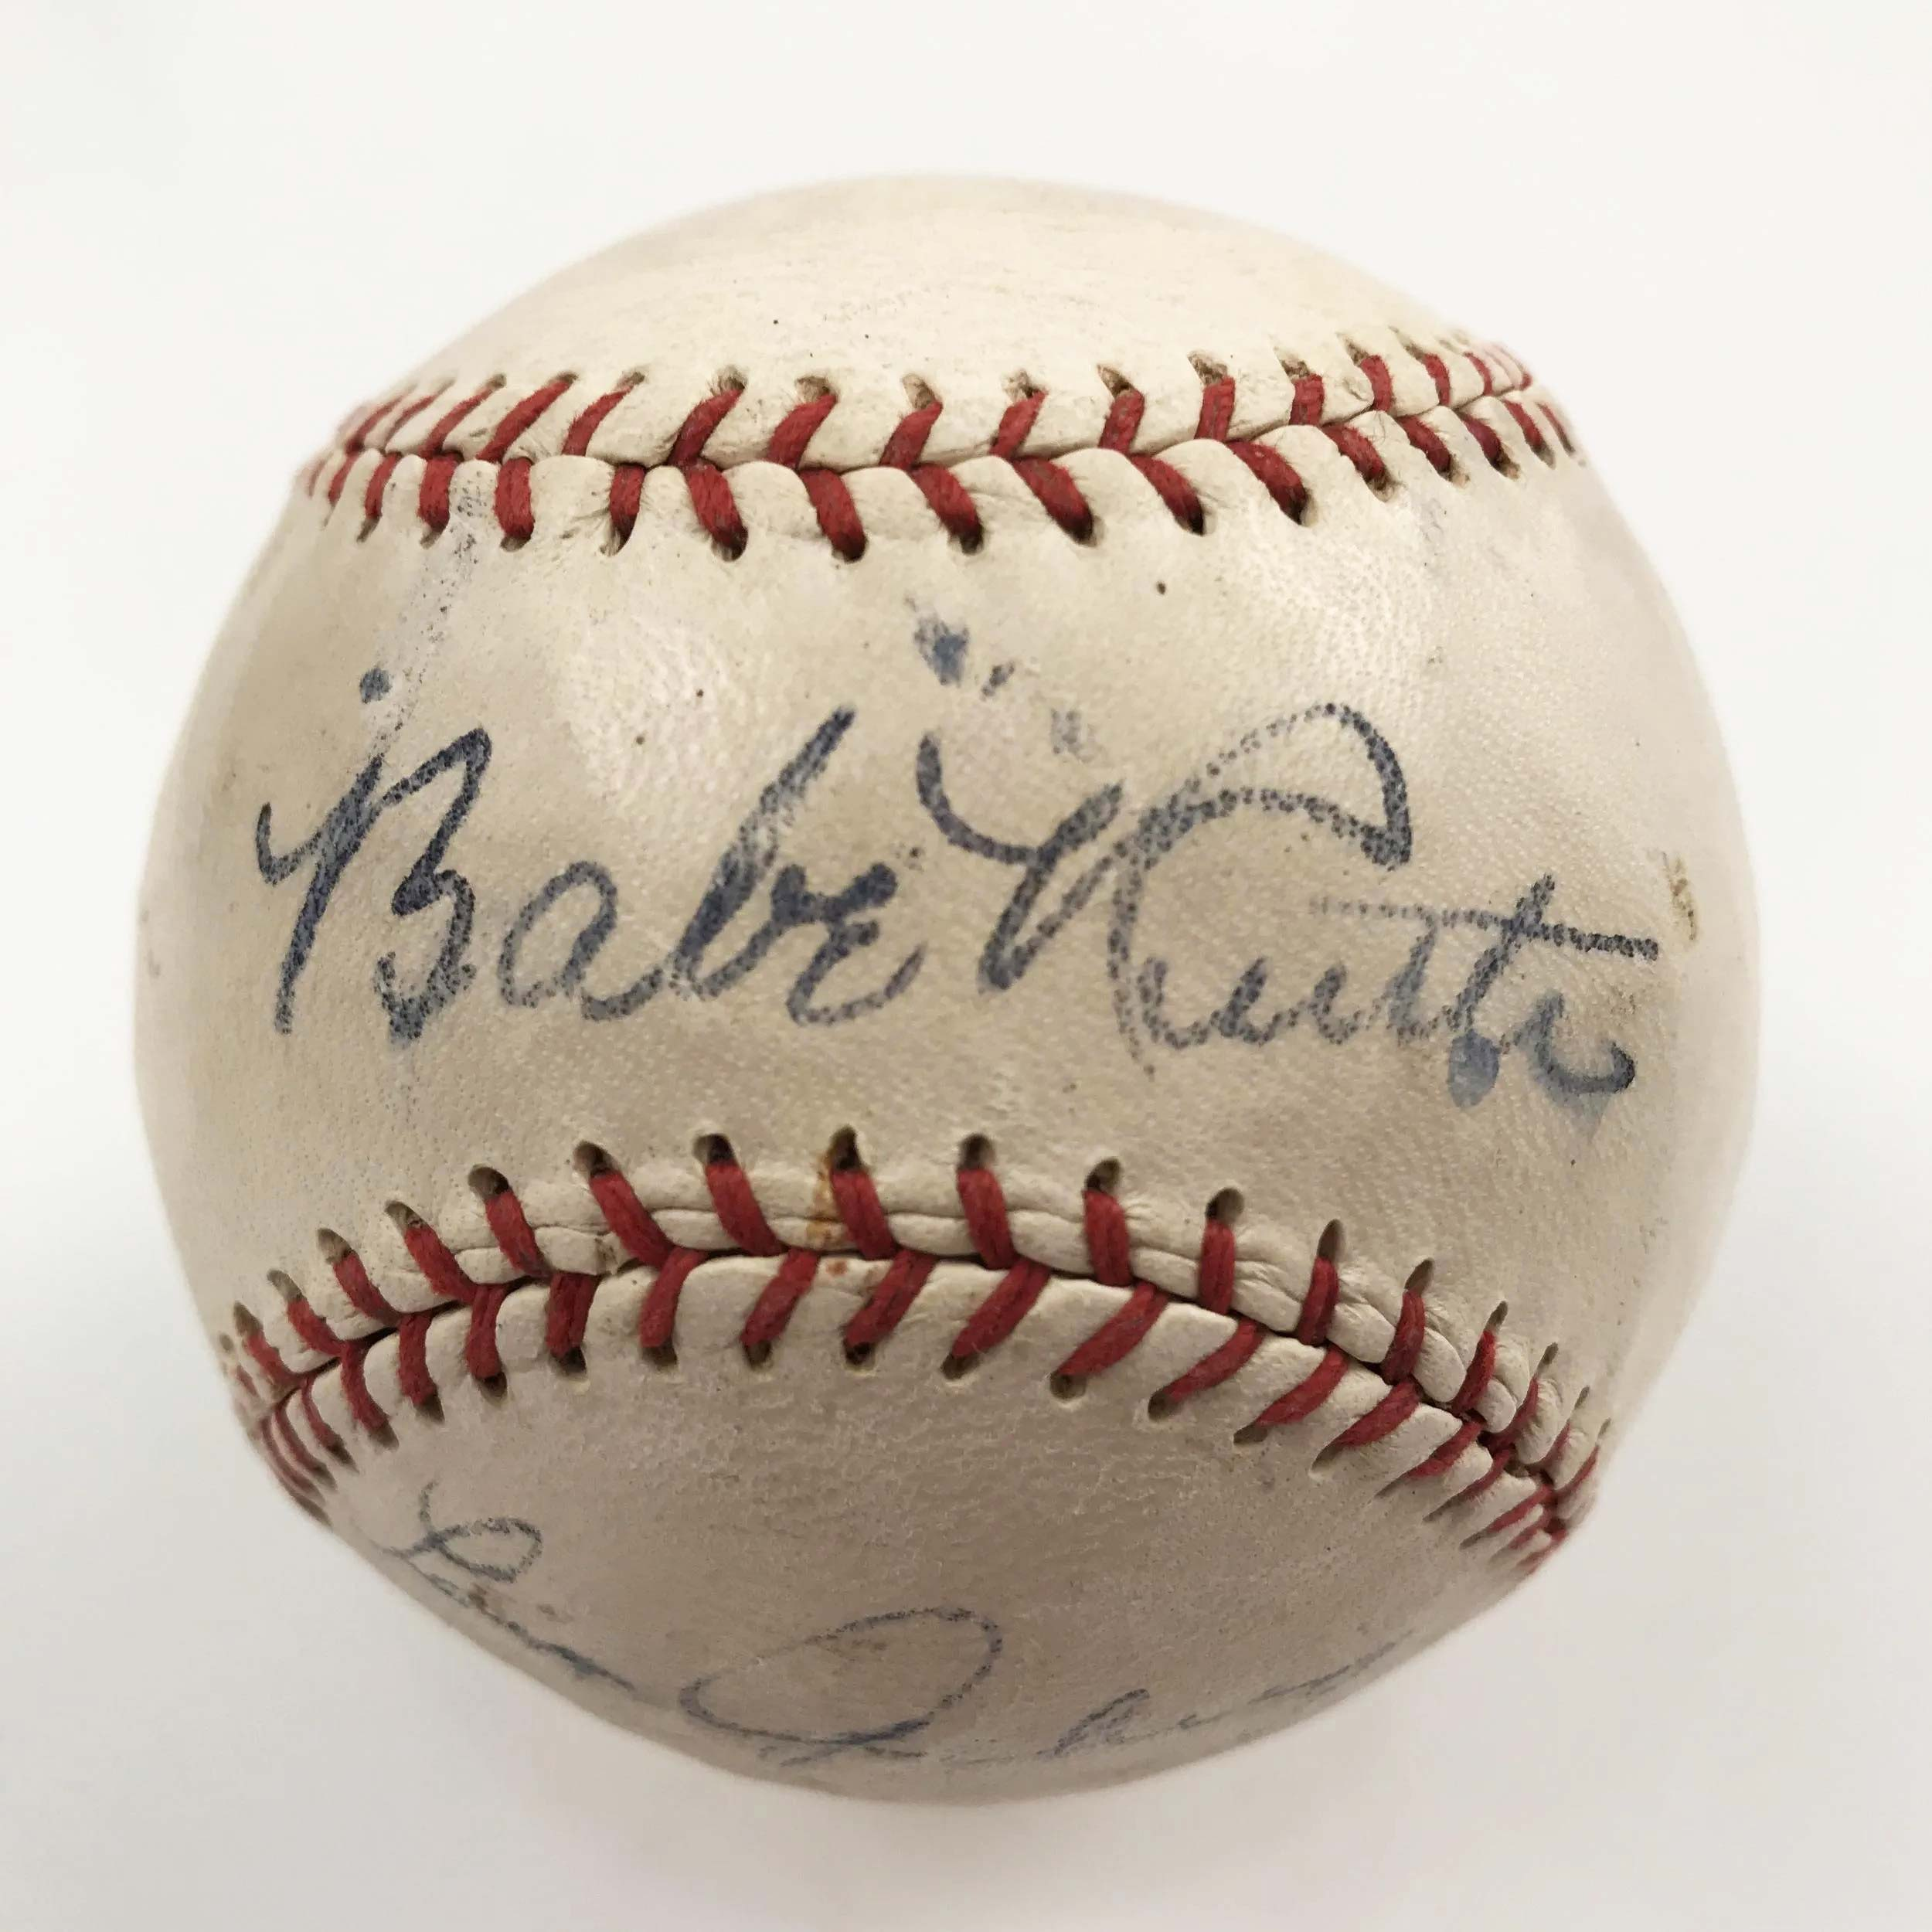 Babe Ruth- and Lou Gehrig-signed Spaulding baseball, estimate $10,000-$15,000. Image courtesy Fine Estate, Inc. and LiveAuctioneers.com